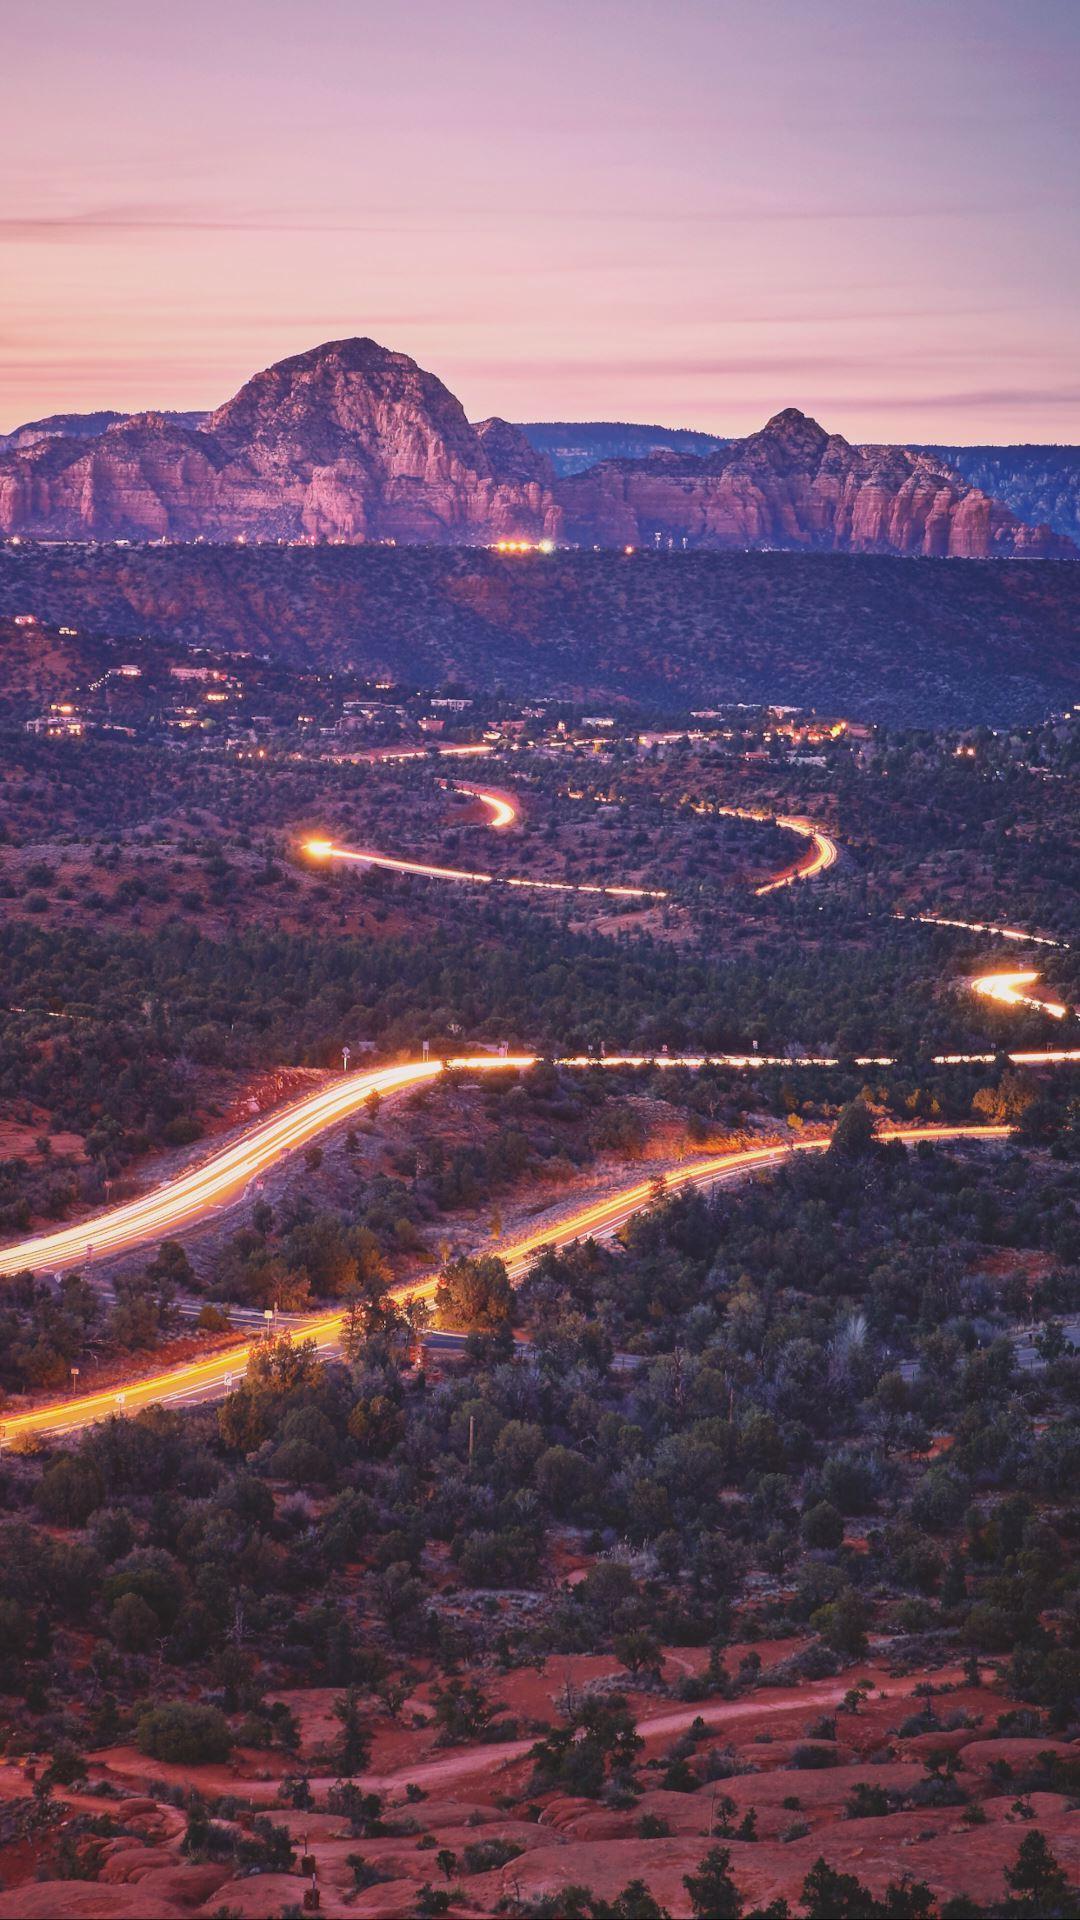 Wallpaper iPhone travel photography Sedona Arizona road trip sunset